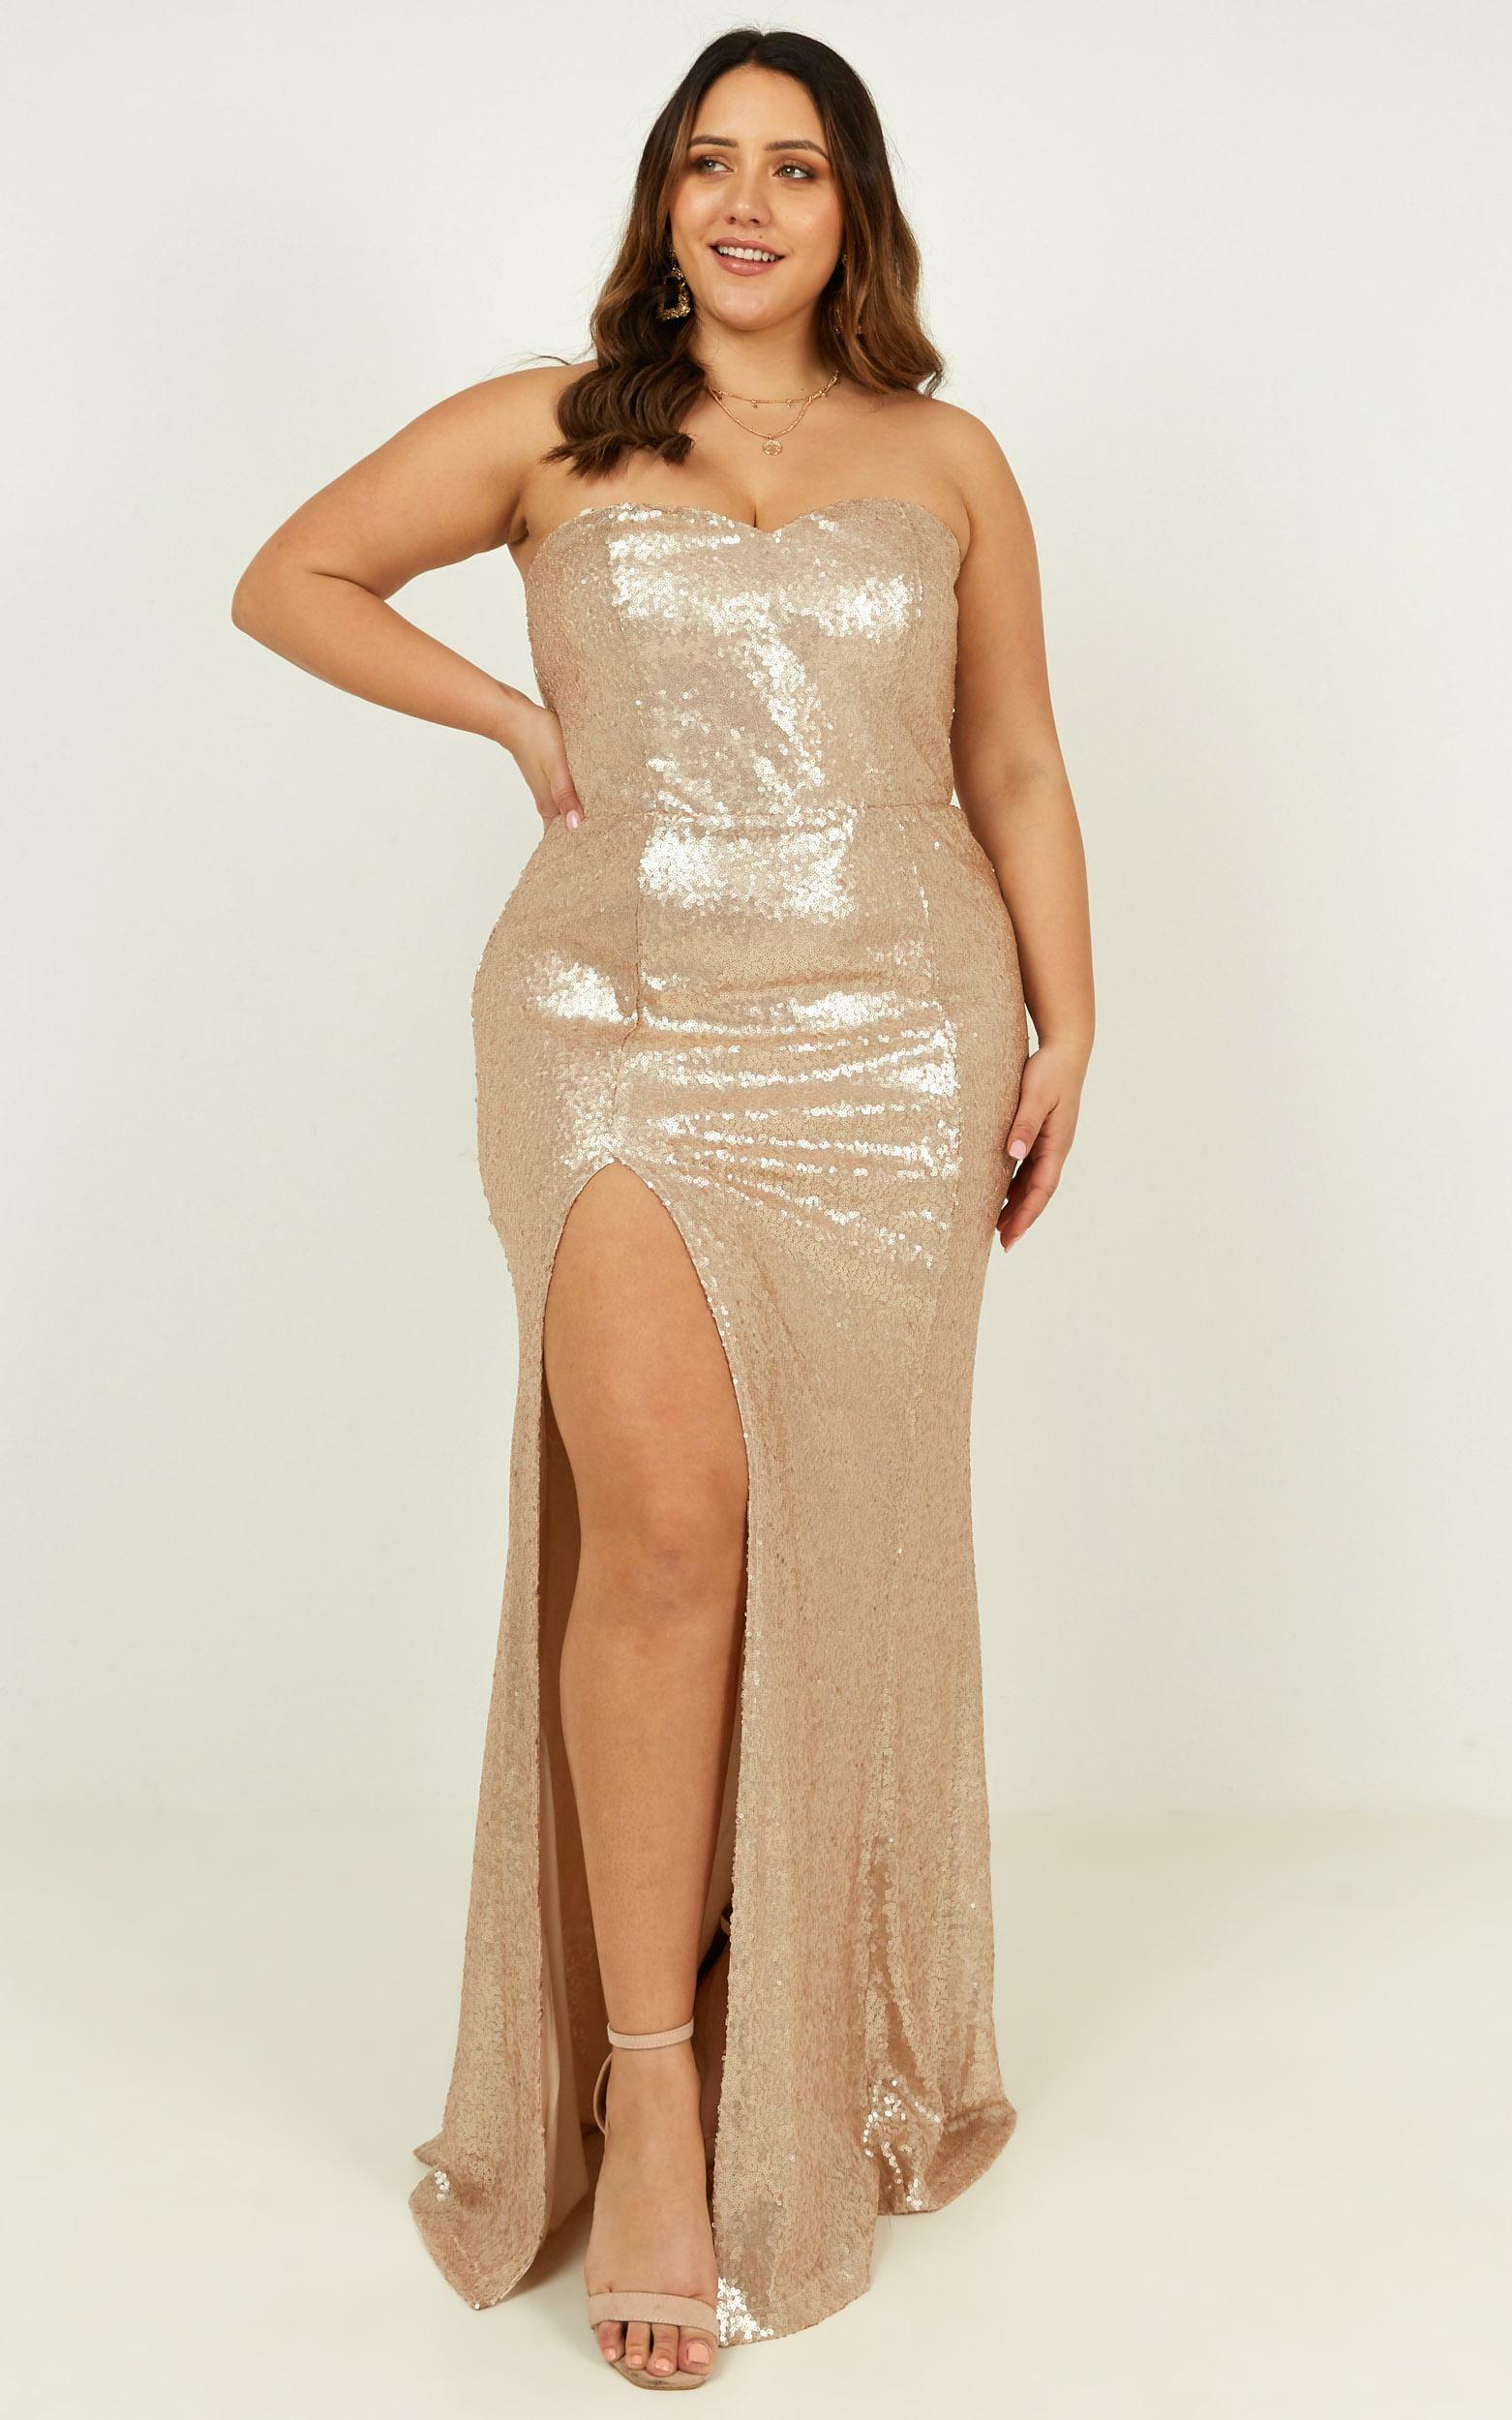 Shimmer Shimmer Dress in champagne sequin - 18 (XXXL), Beige, hi-res image number null